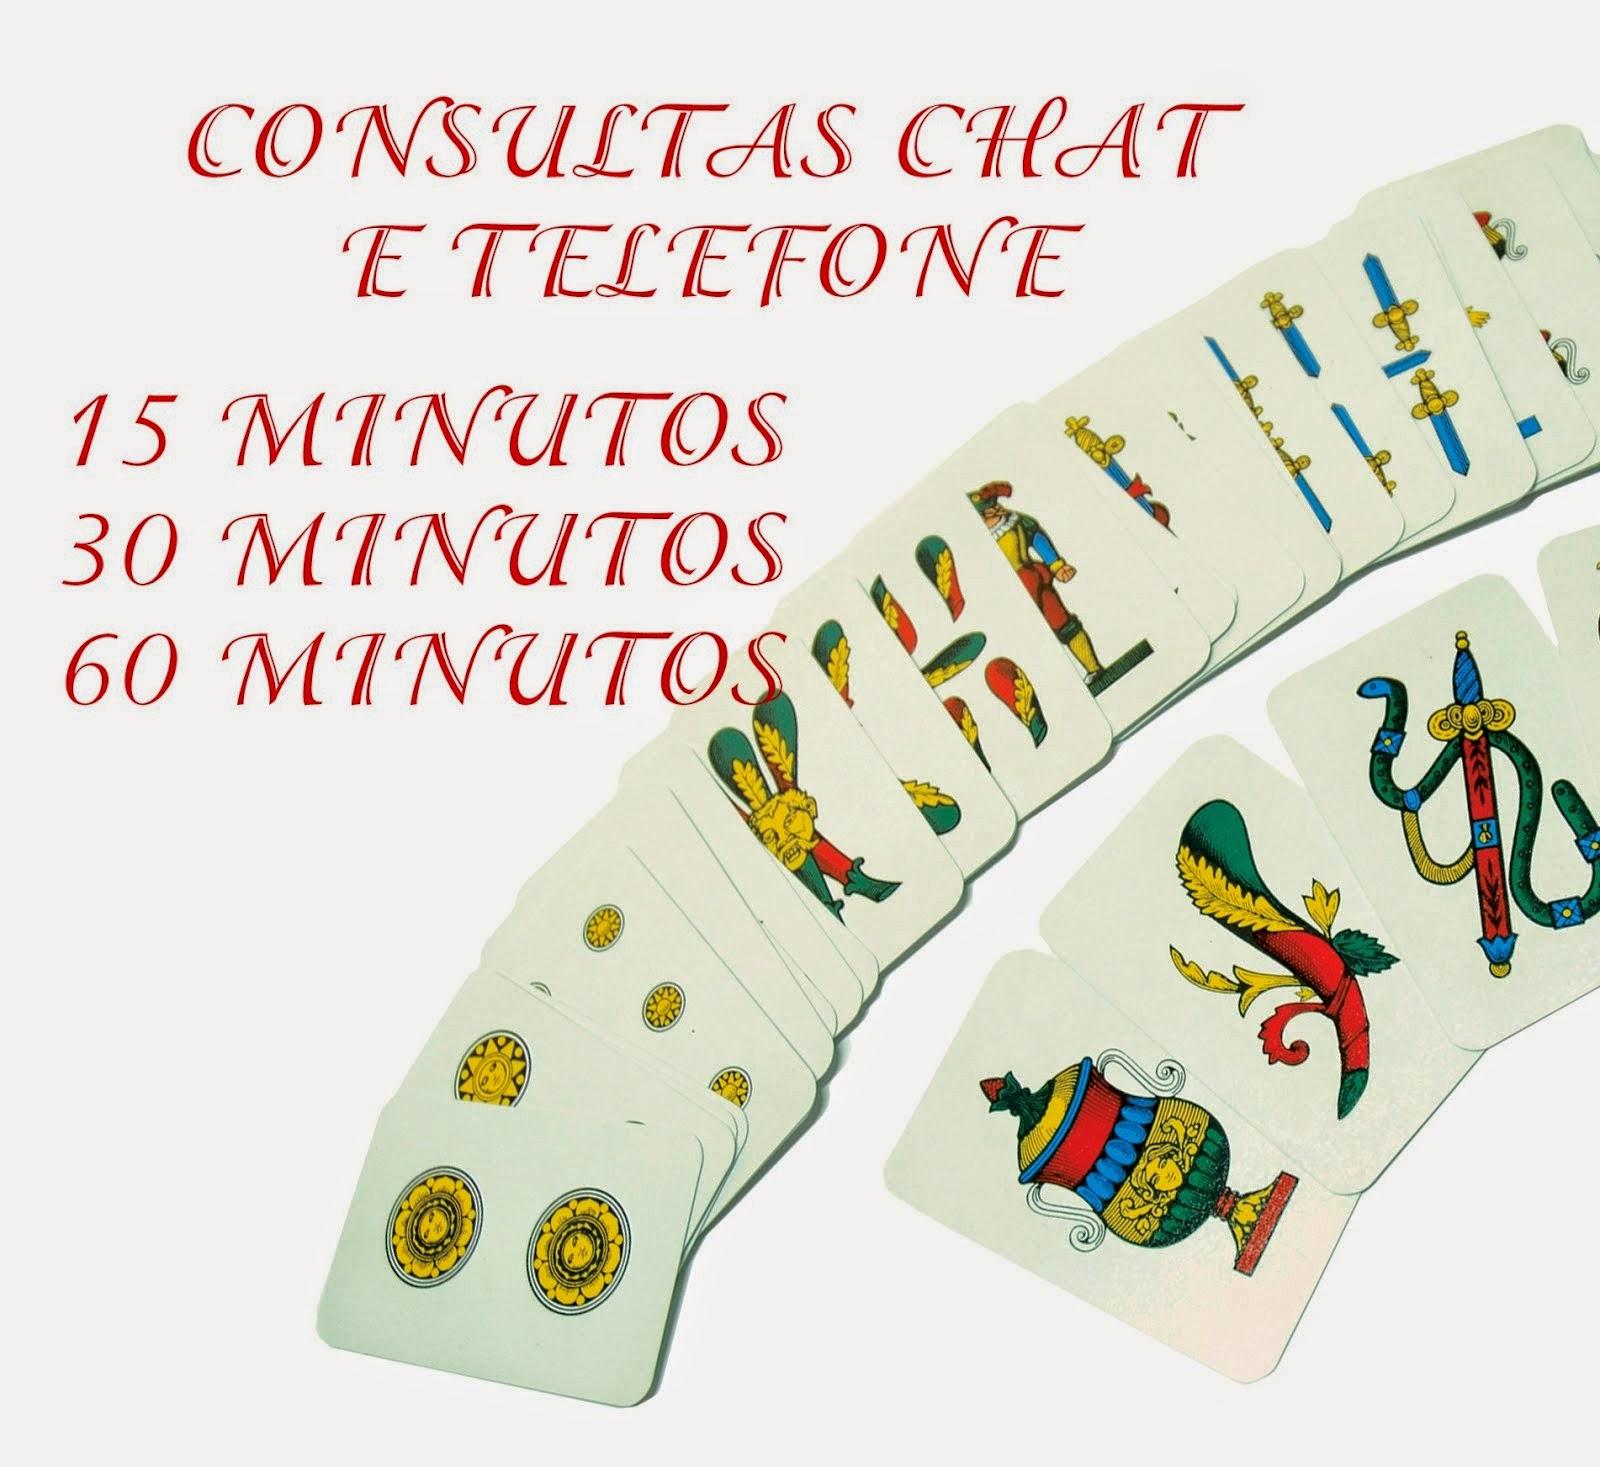 CHAT OU TELEFONE